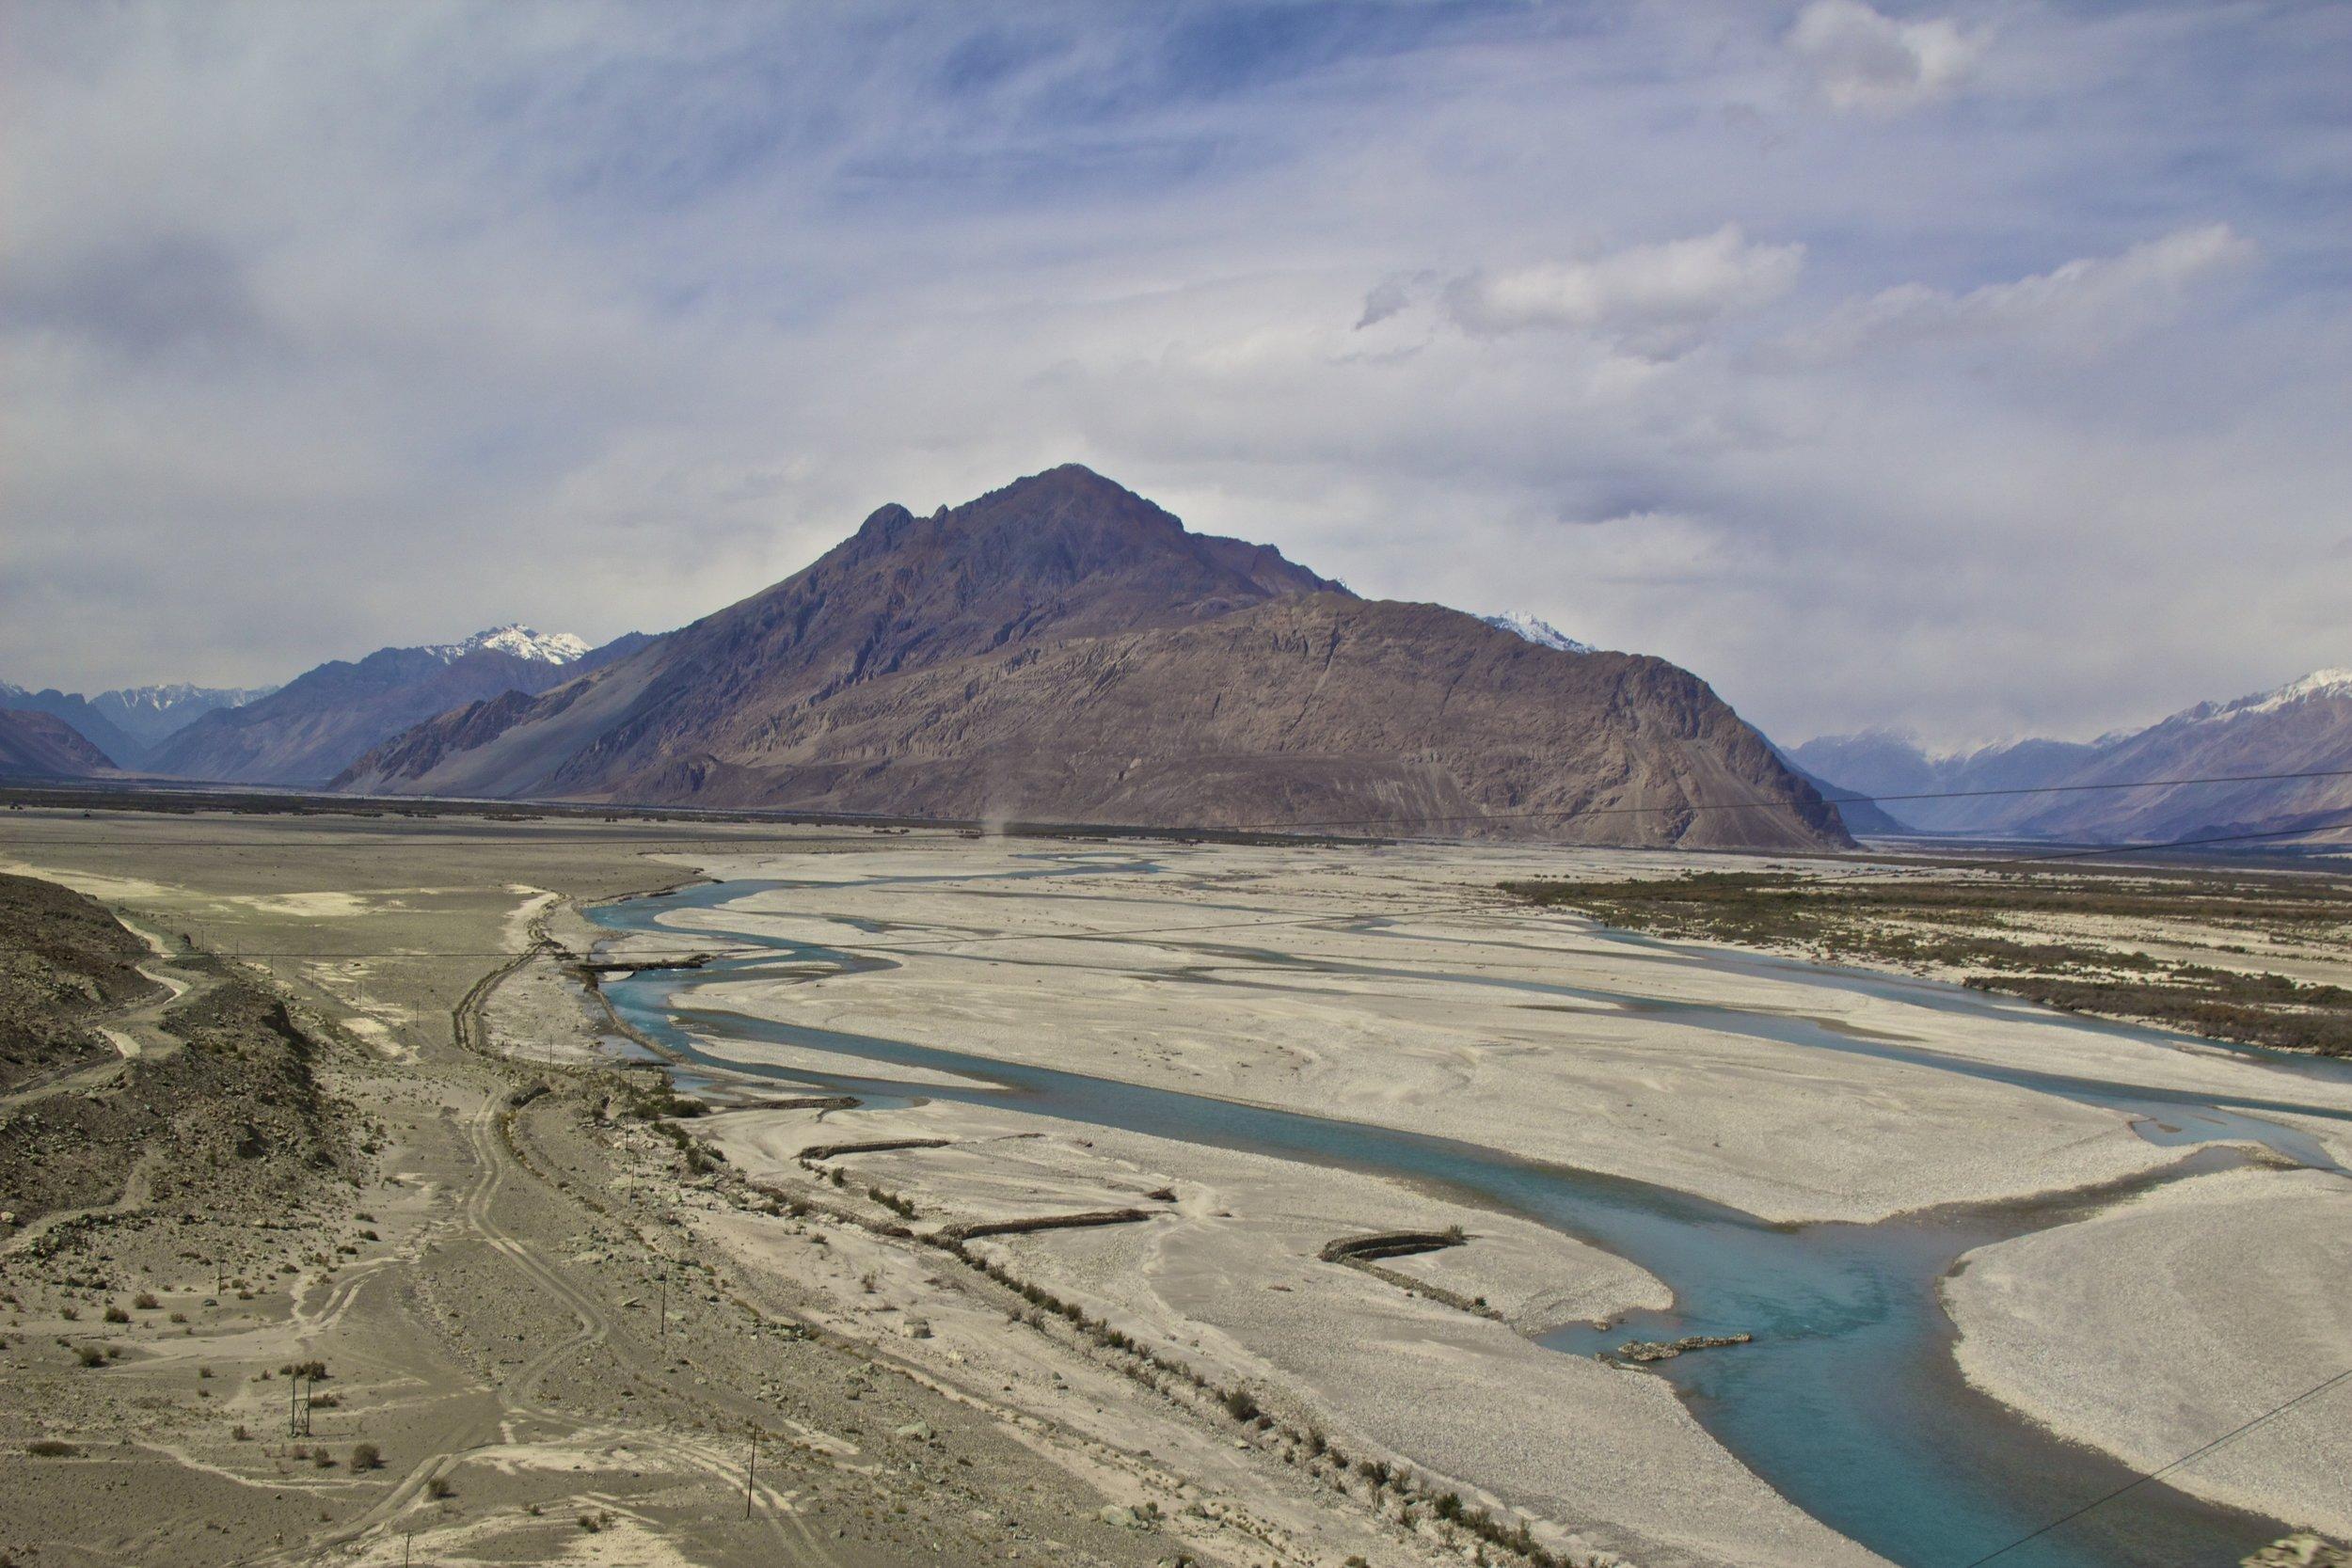 Shyok River Ladakh Gilgit Baltistan Indian Himalayas Nubra Valley 2.jpg